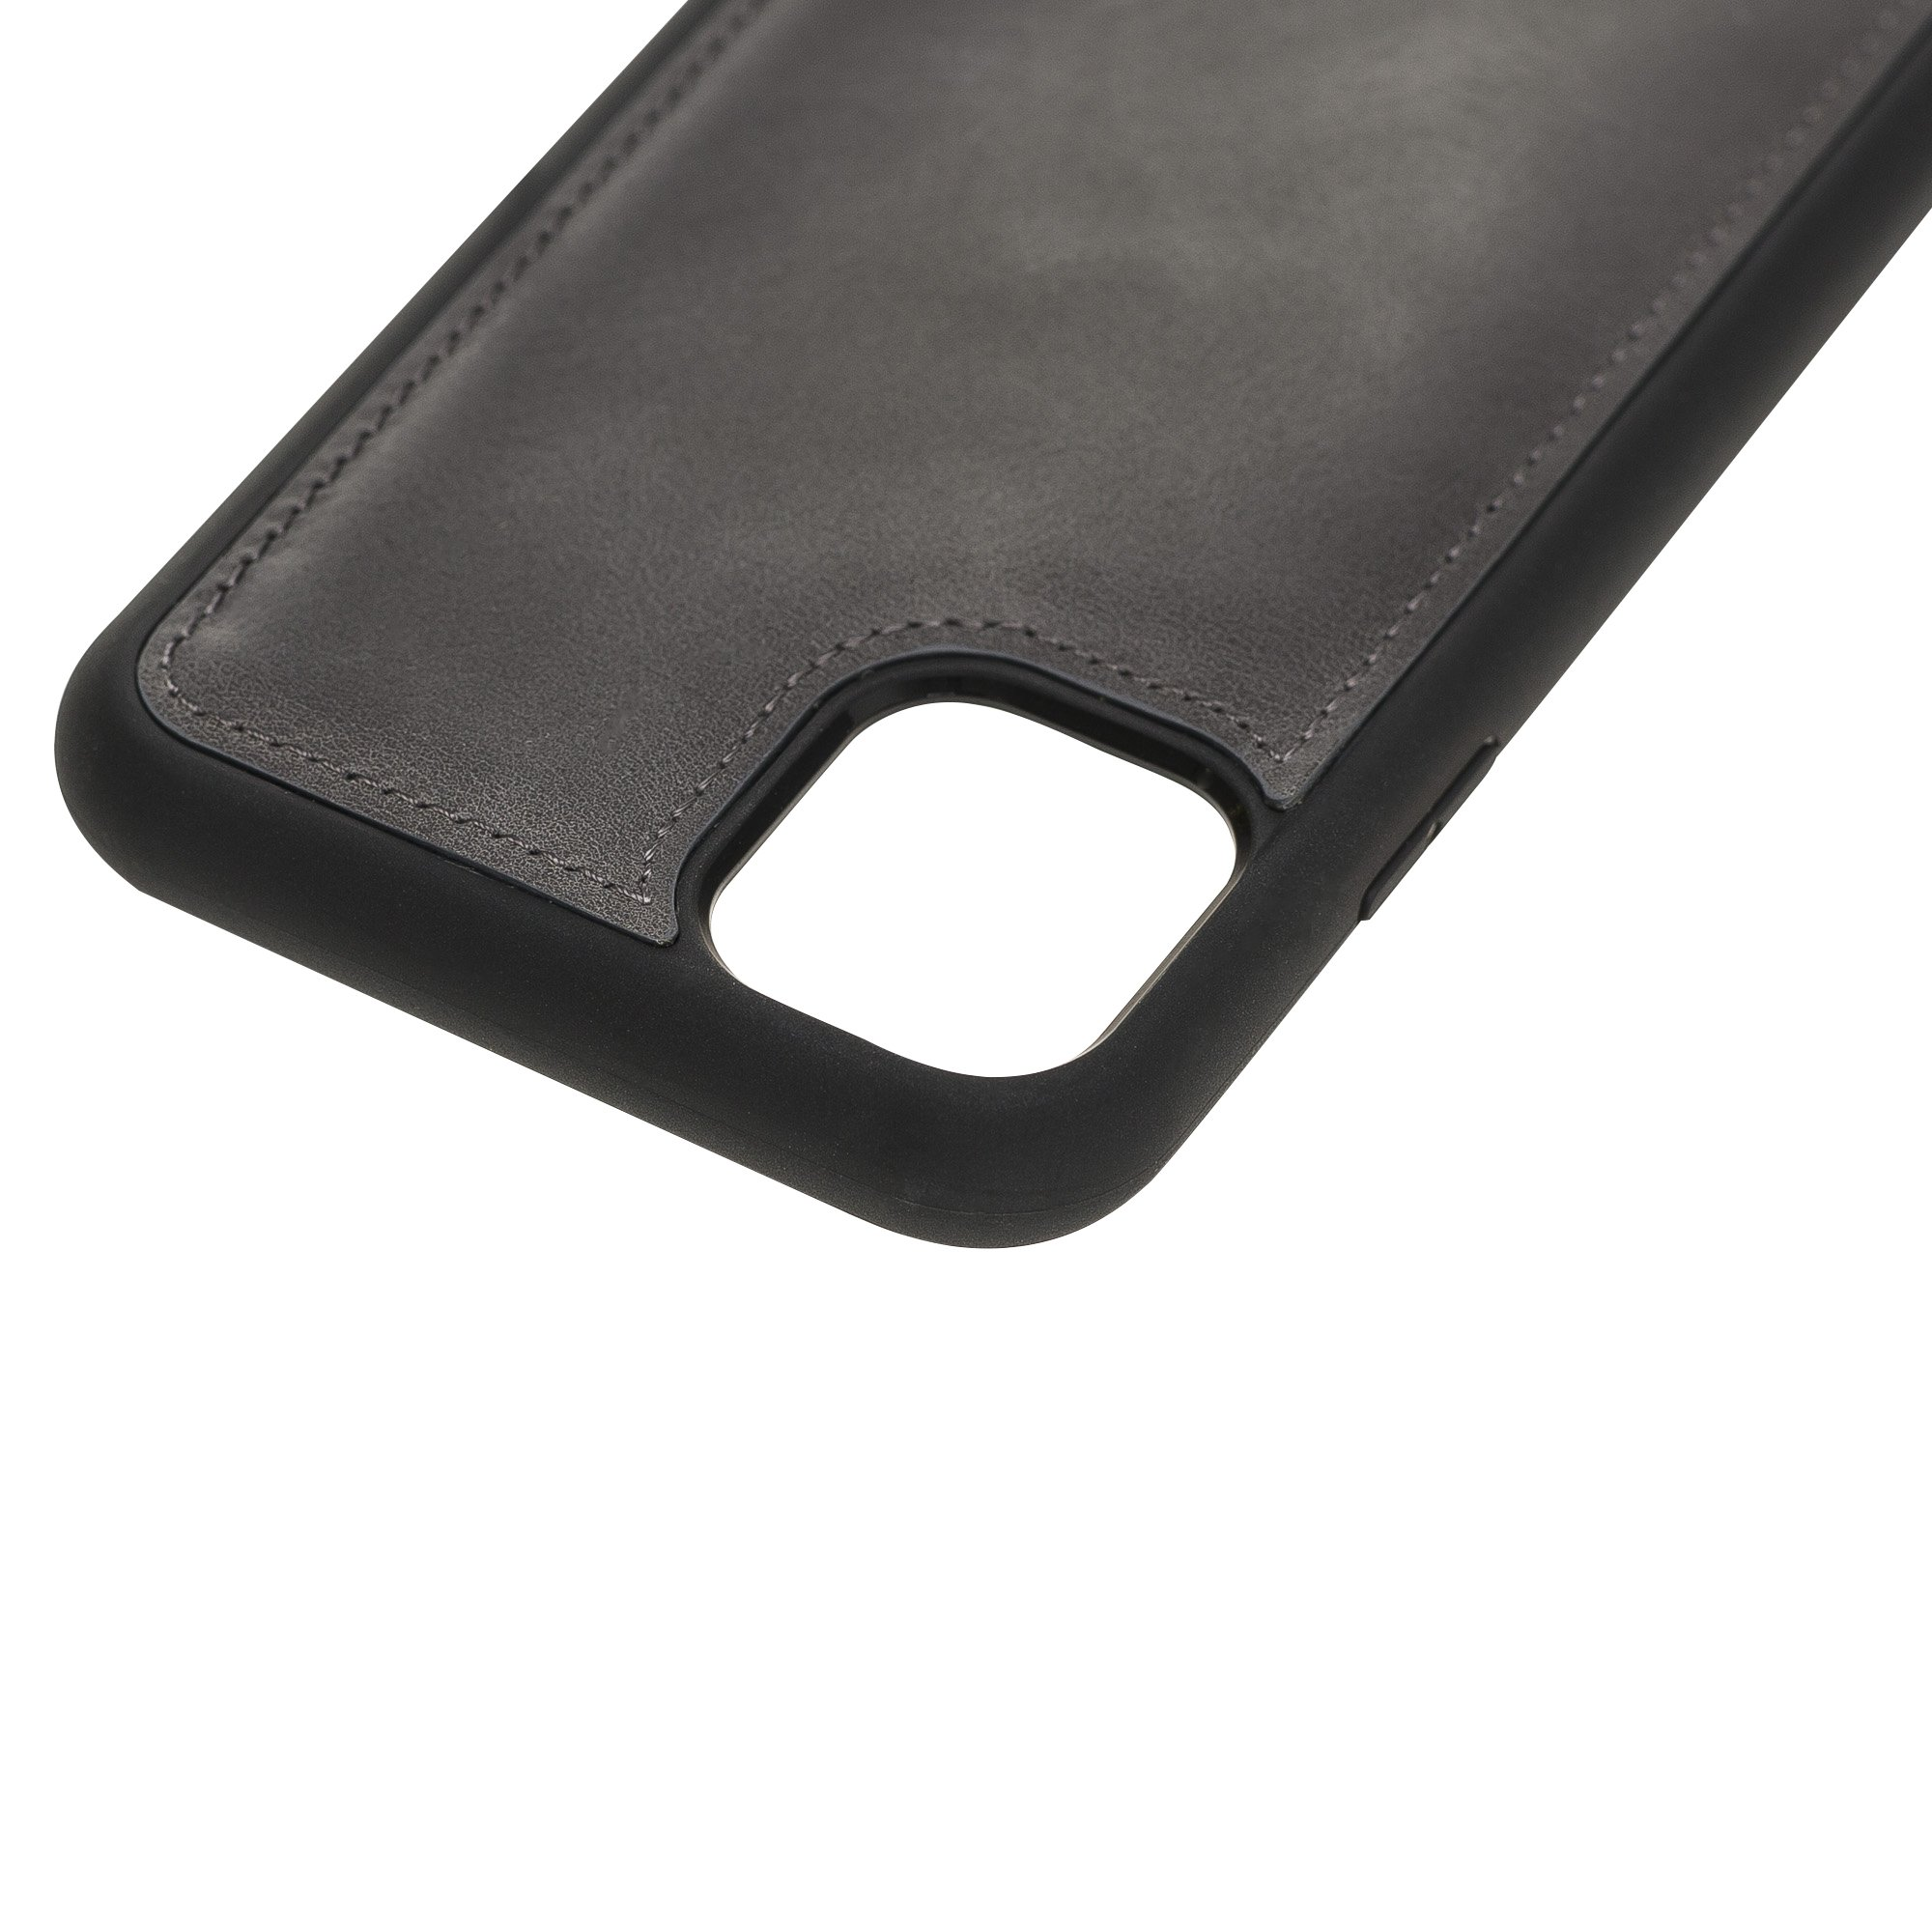 Solo Pelle Lederhülle für das iPhone 11 Pro (Max) 6.5 Zoll Stanford Case Leder Hülle Ledertasche Backcover aus echtem Leder (Steingrau Burned)